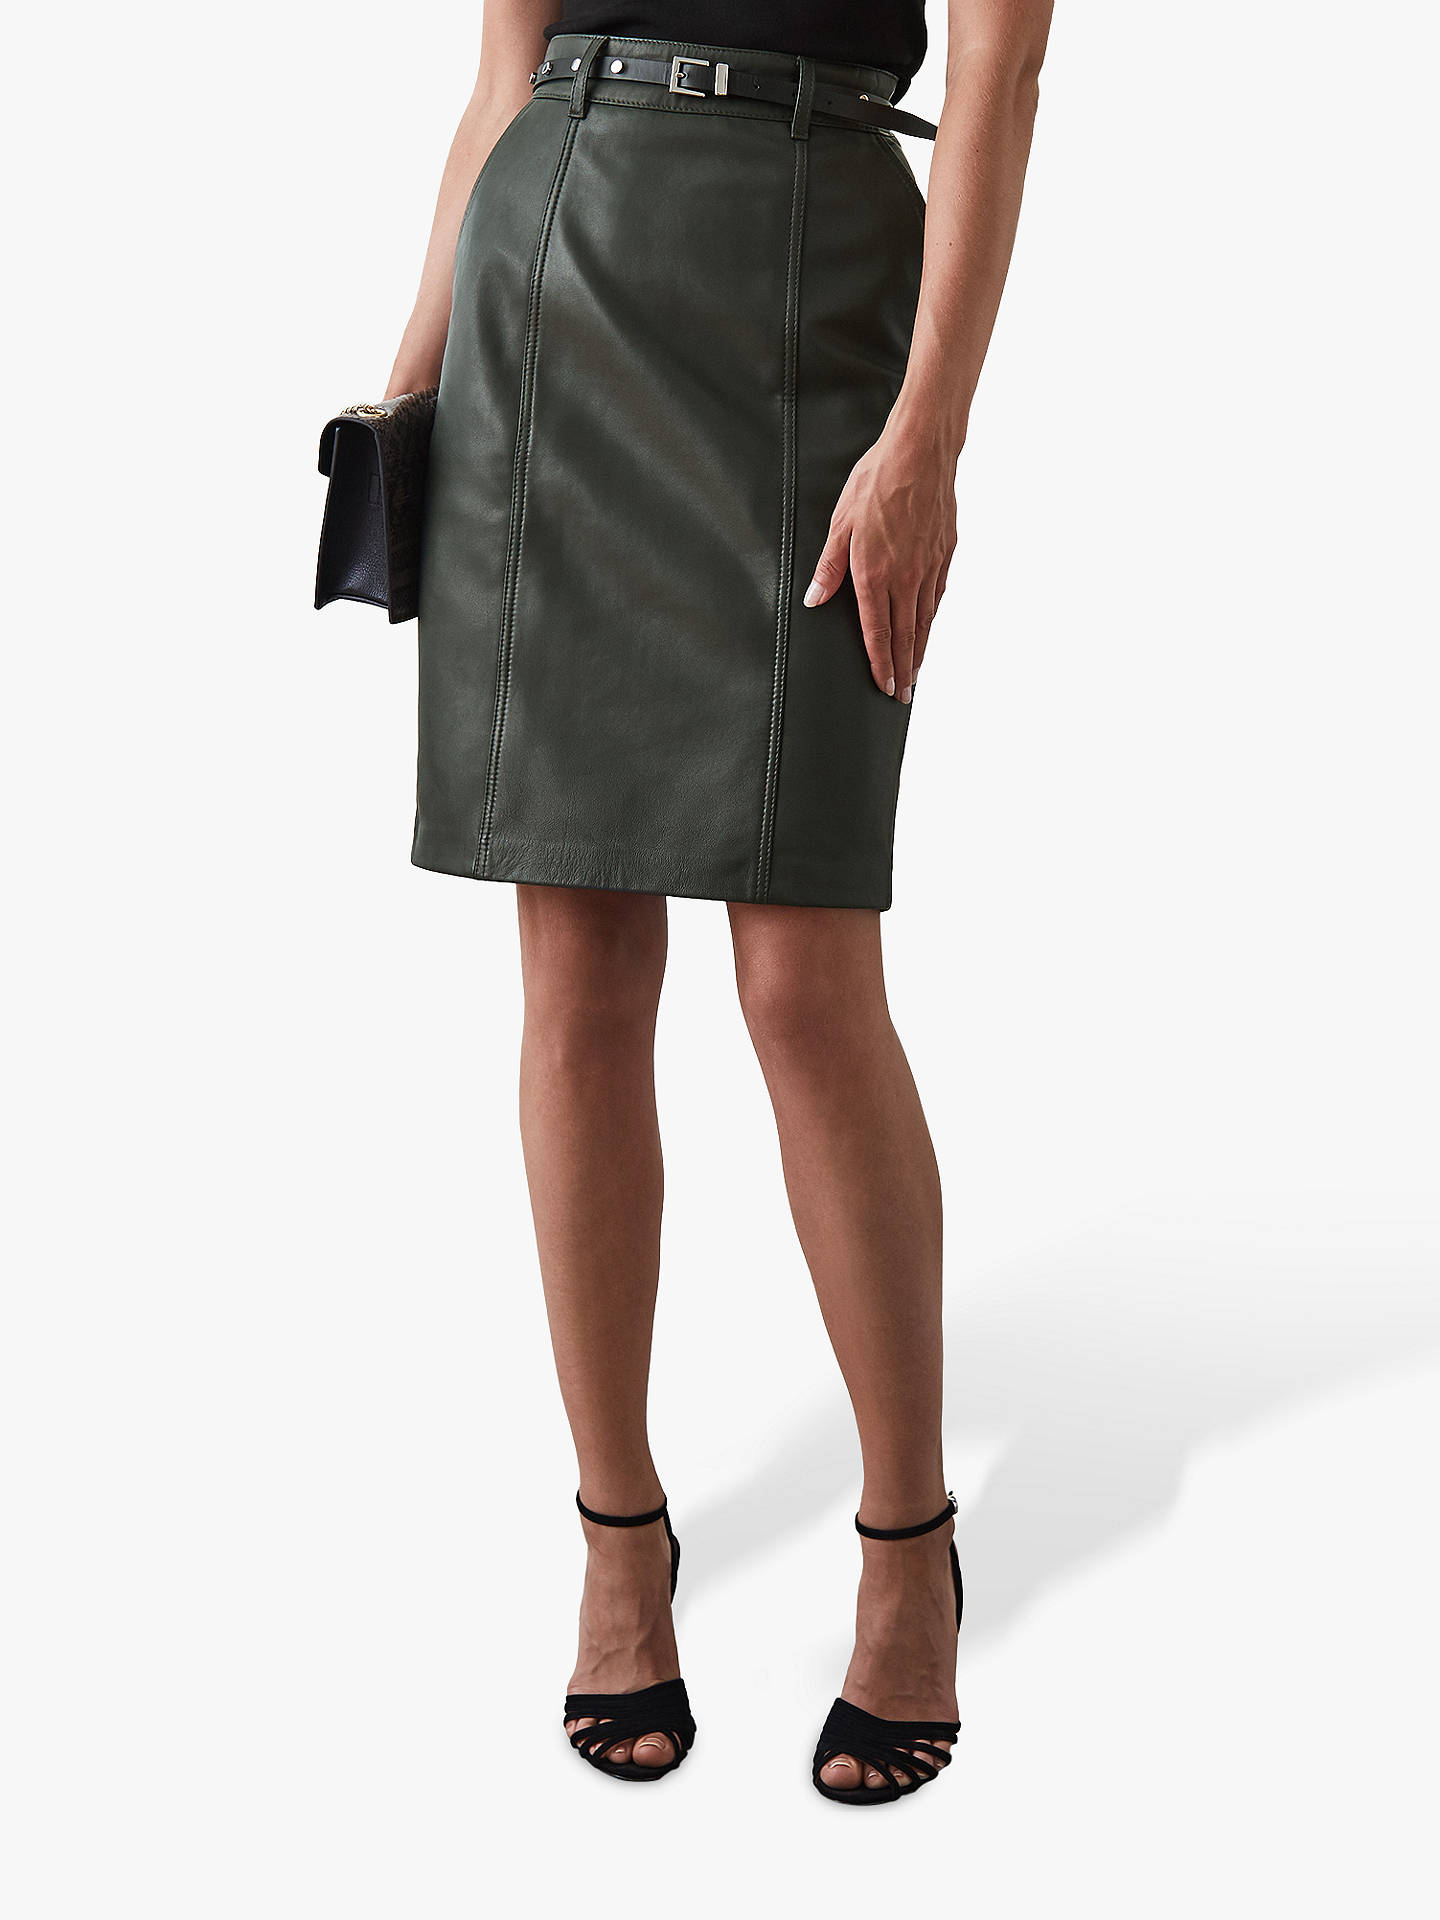 a211f005cb Reiss Kara Leather Pencil Skirt, Army Green